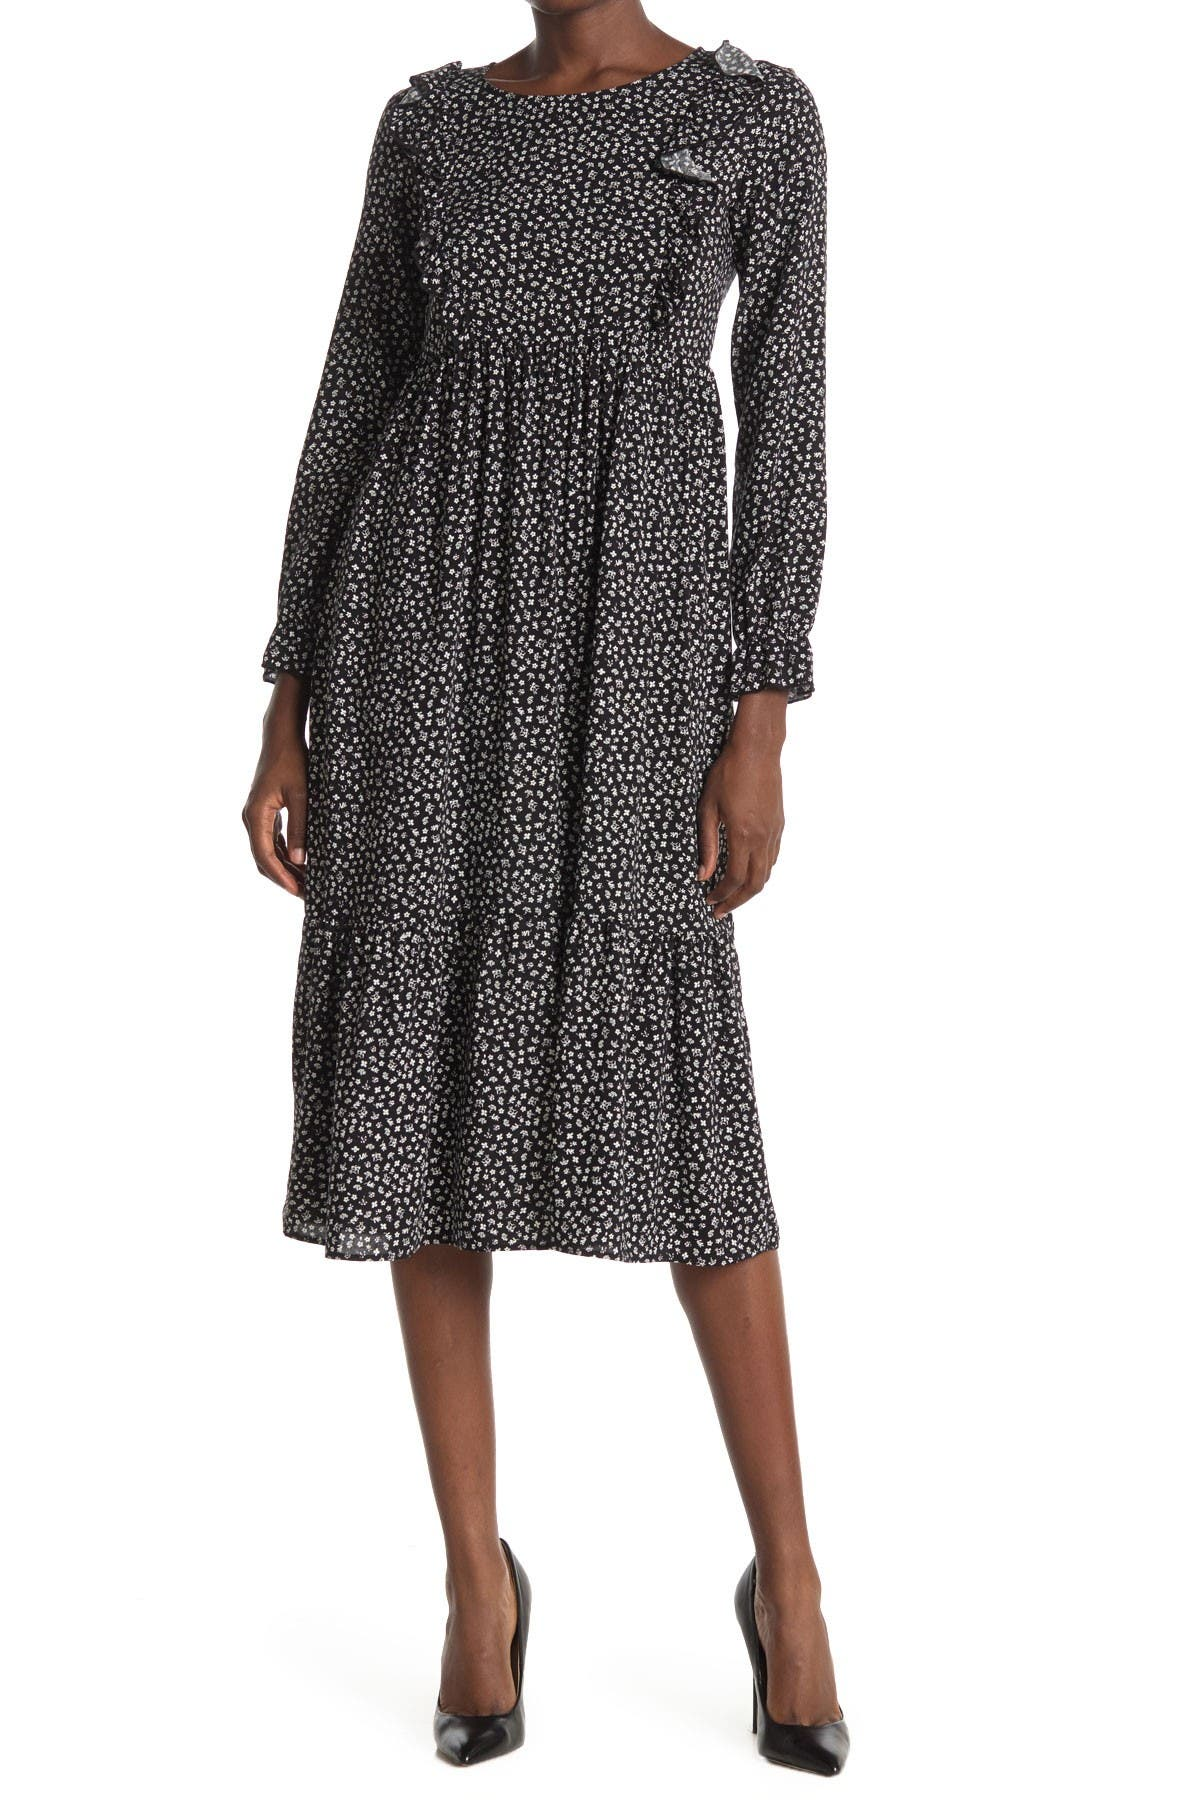 Image of Velvet Torch Printed Ruffle Midi Dress